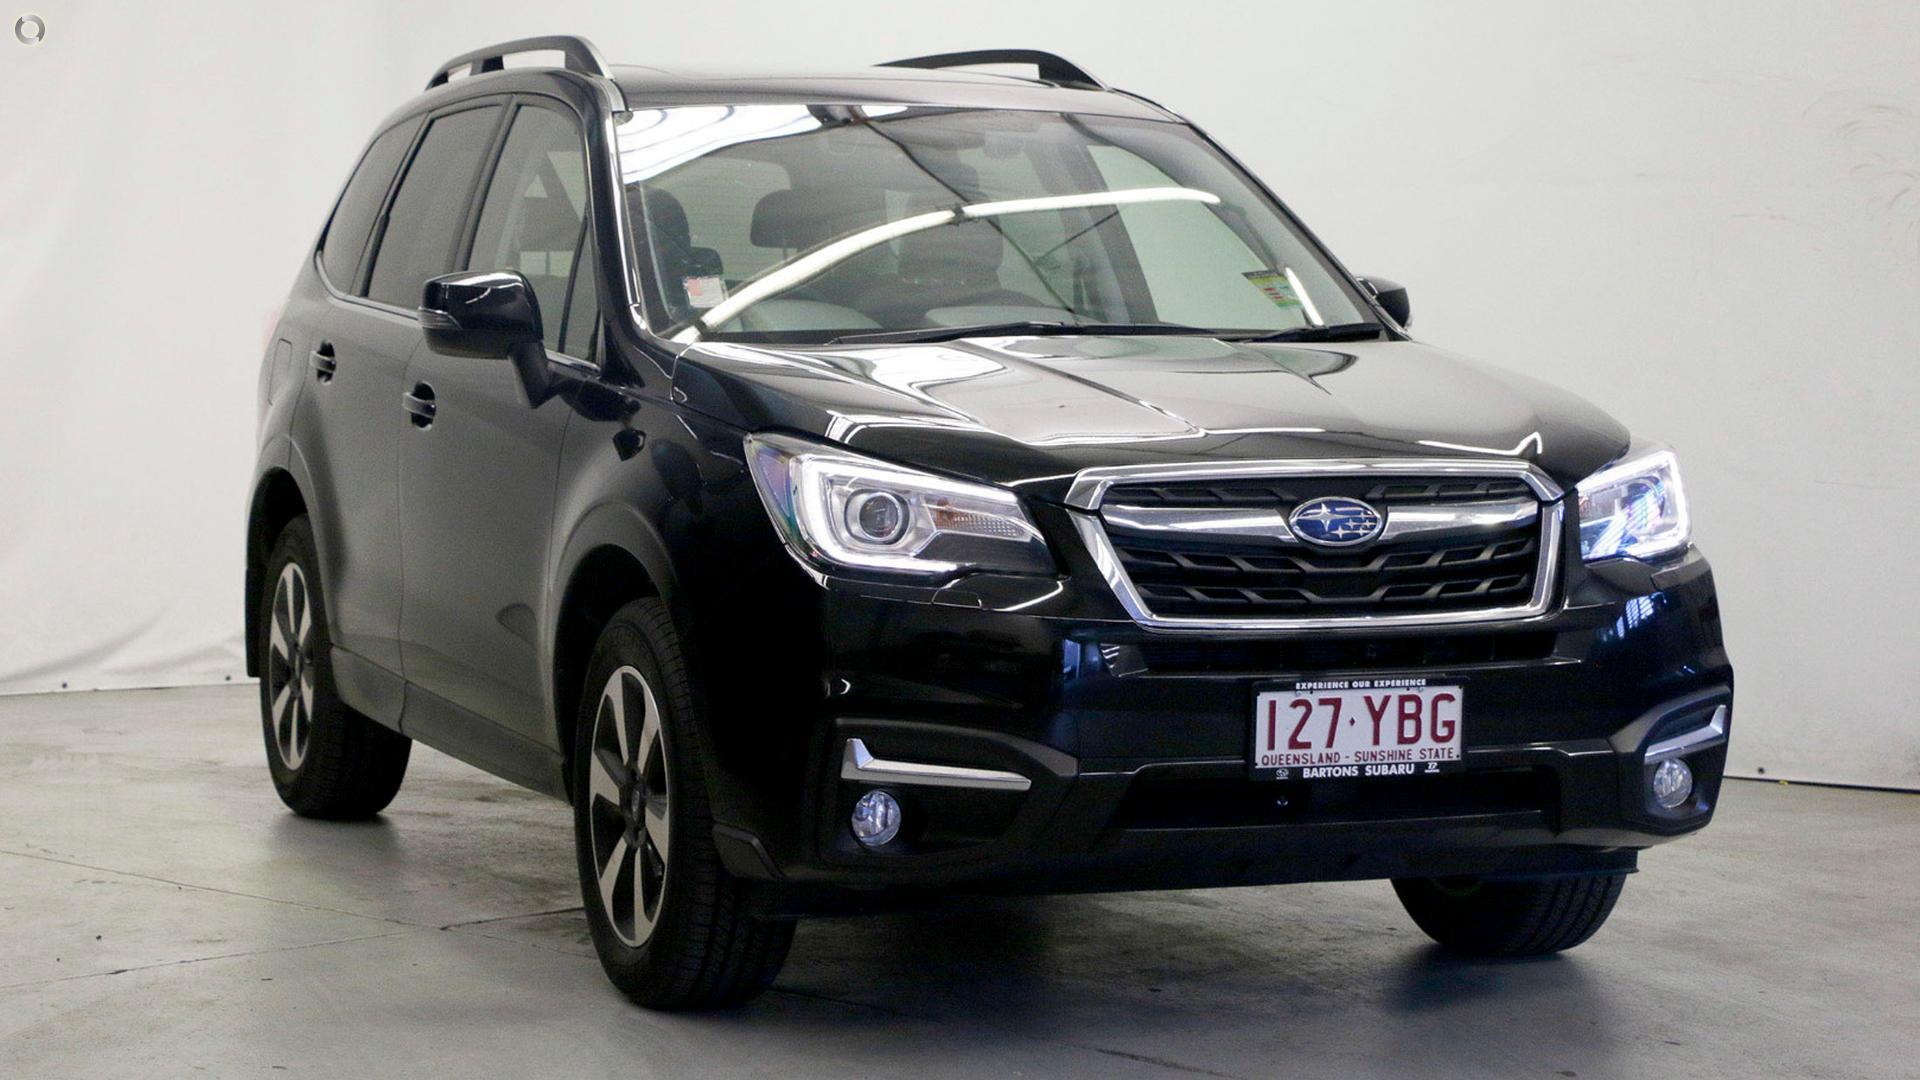 2017 Subaru Forester 2.5i-l Special Edition